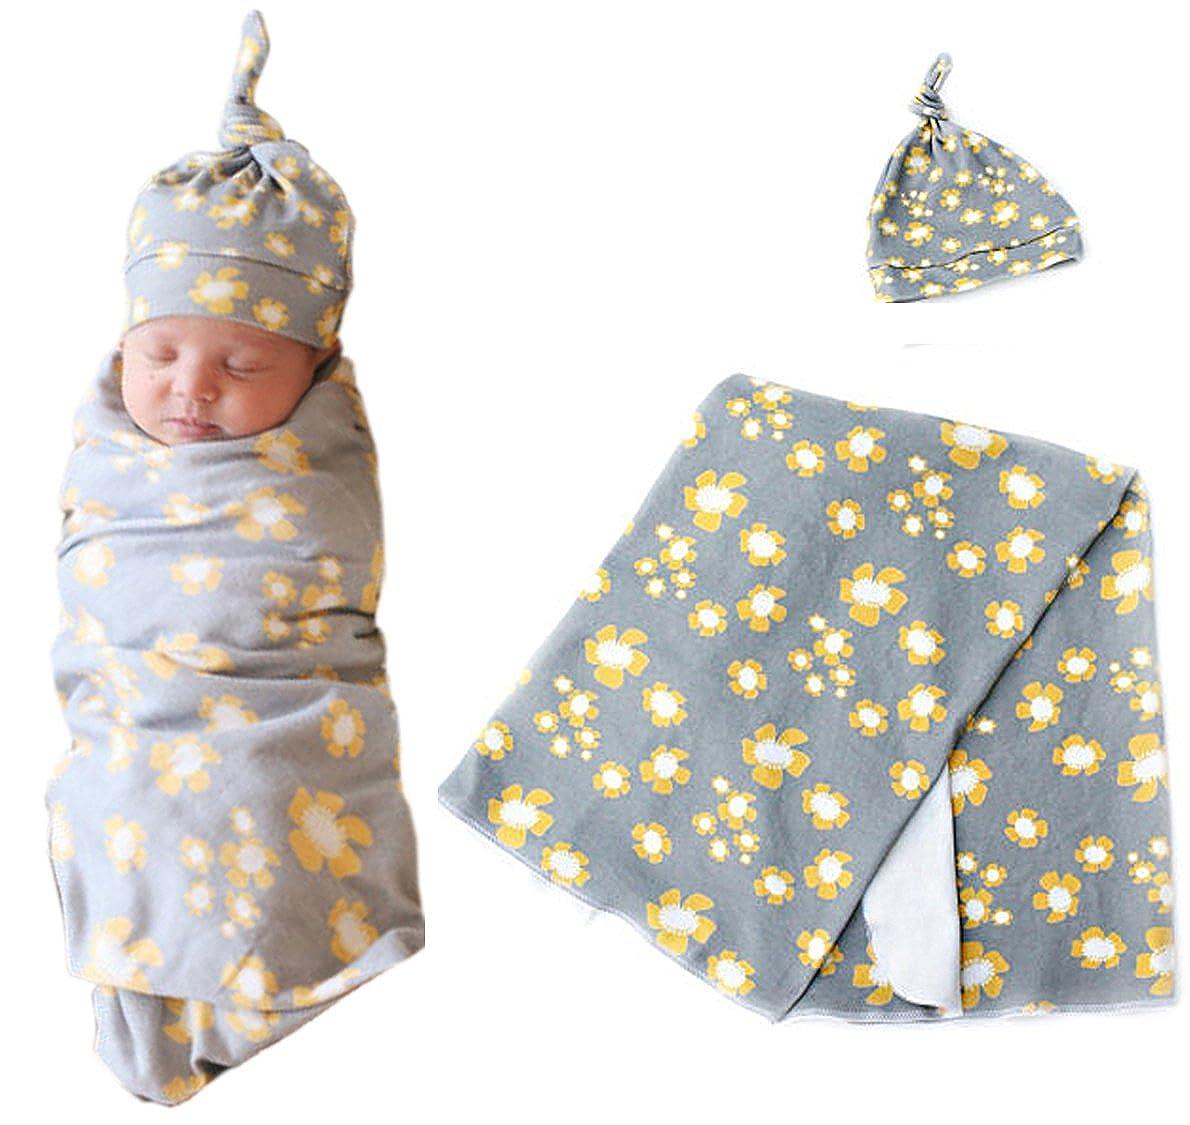 Chinatera Newborn Baby Girls 2pcs Daisy Flower Print Swaddle Infant Toddlers Bath Towel Wrap Sleeping Bag Receiving Blanket Cute Knot Hat Set